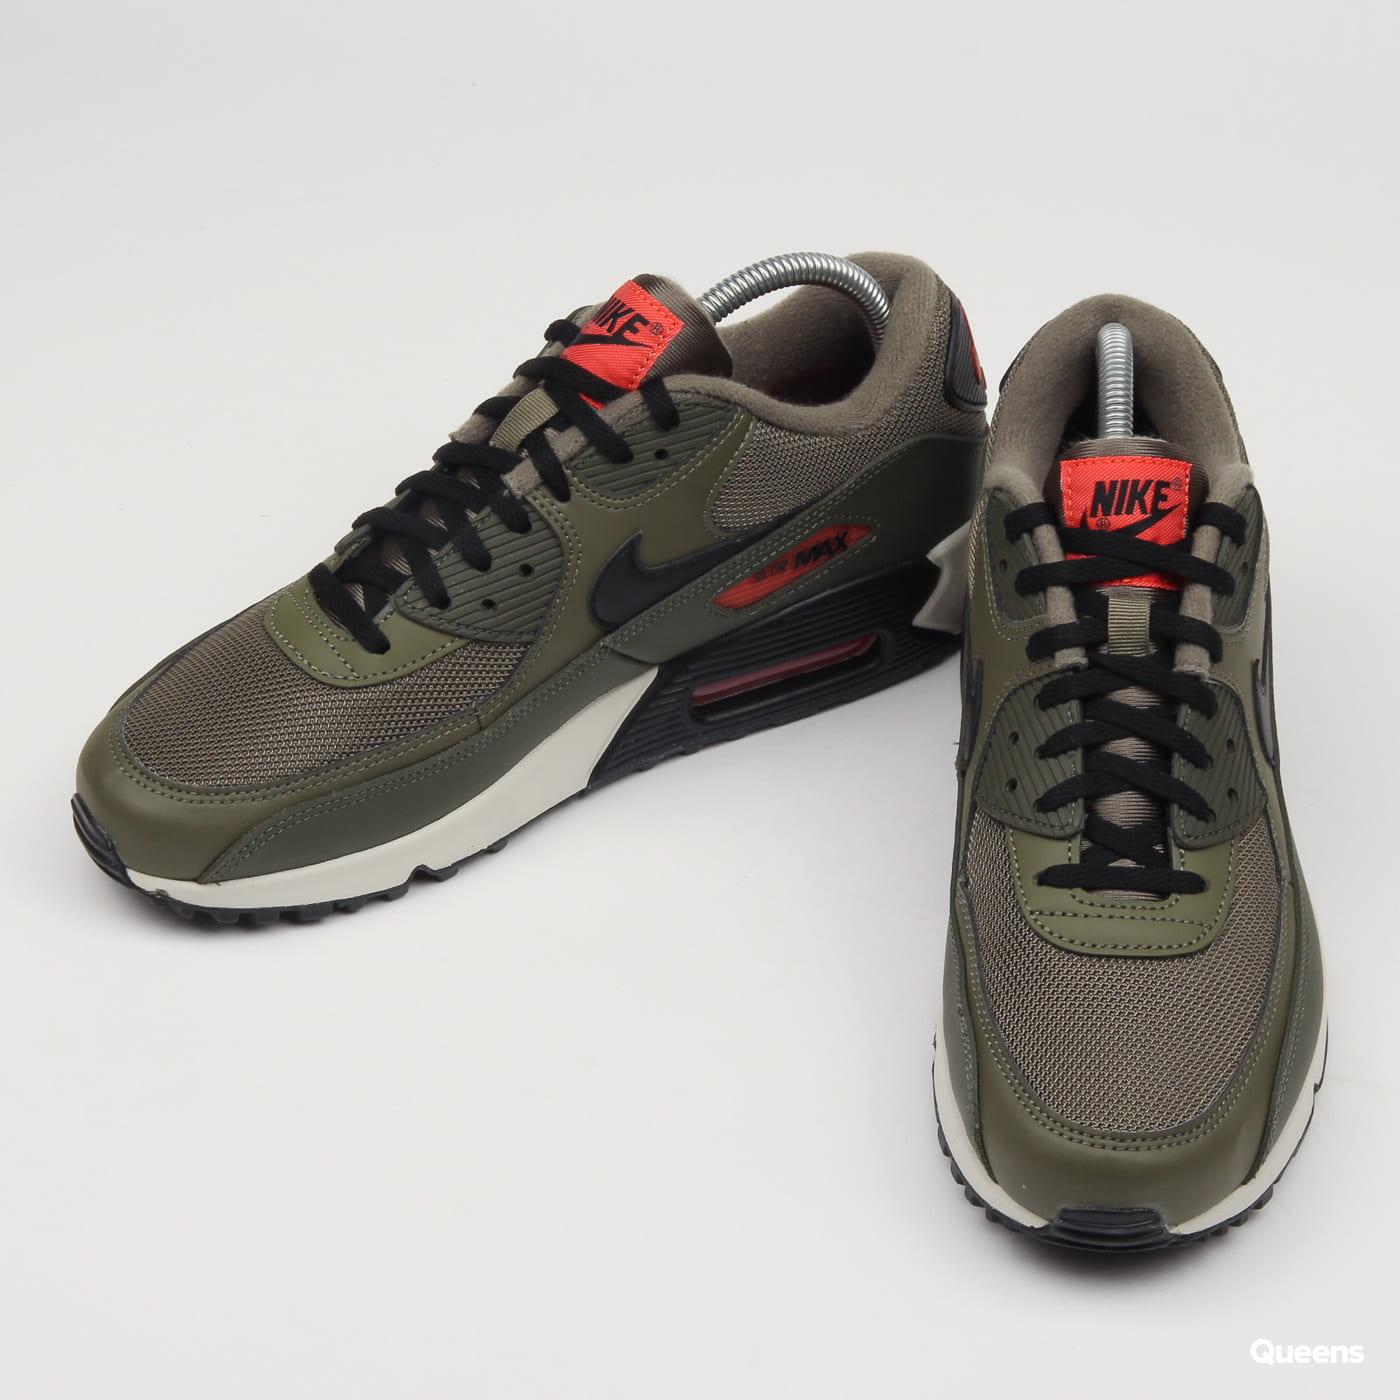 premium selection 3523d c6567 Zoom in Zoom in Zoom in Zoom in Zoom in. Nike Air Max 90 Essential ...